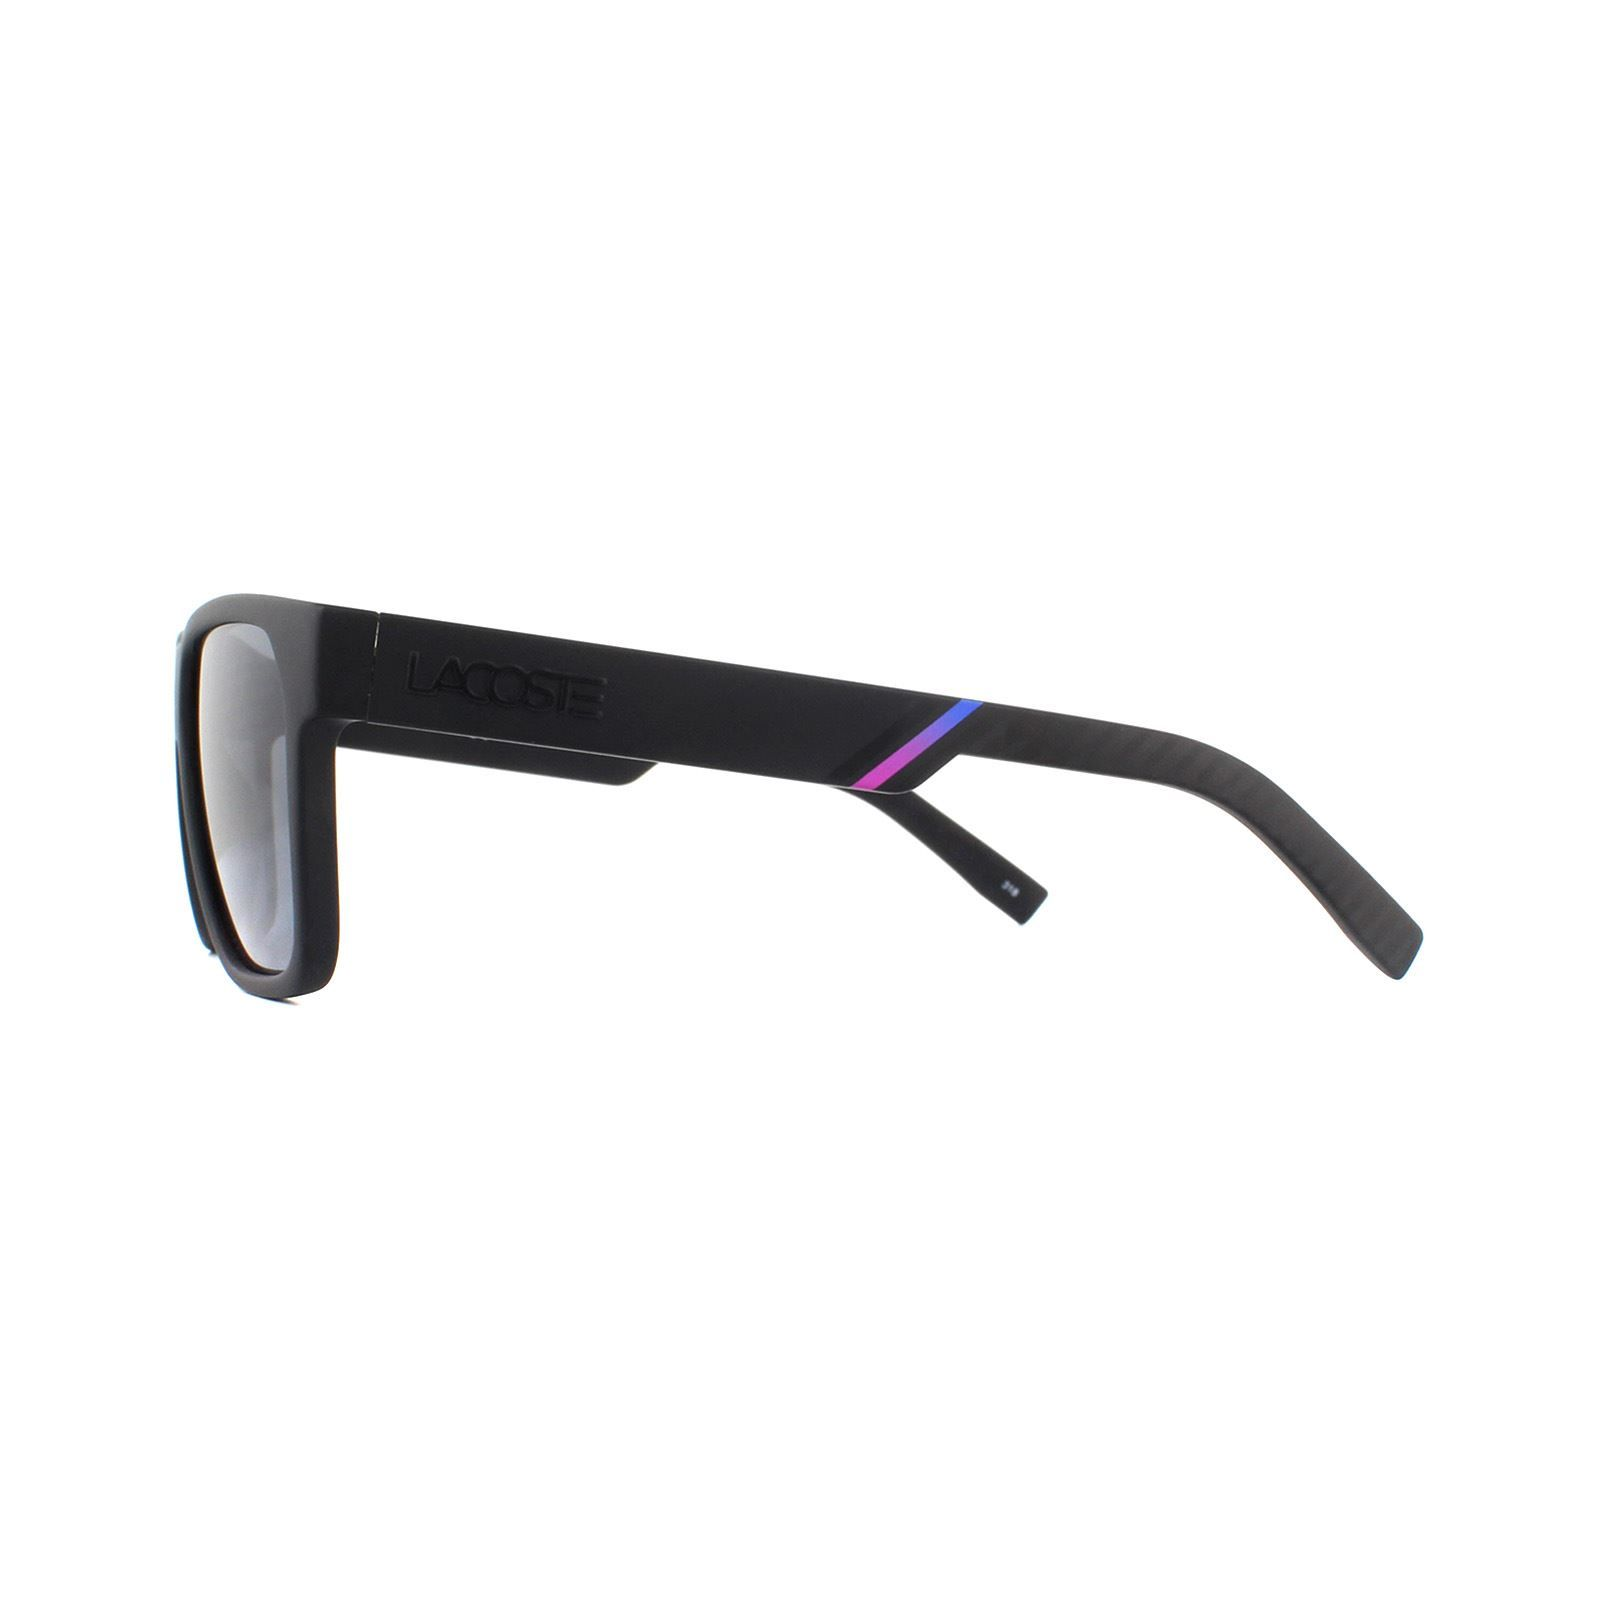 Lacoste Sunglasses L867S 002 Matte Black Grey